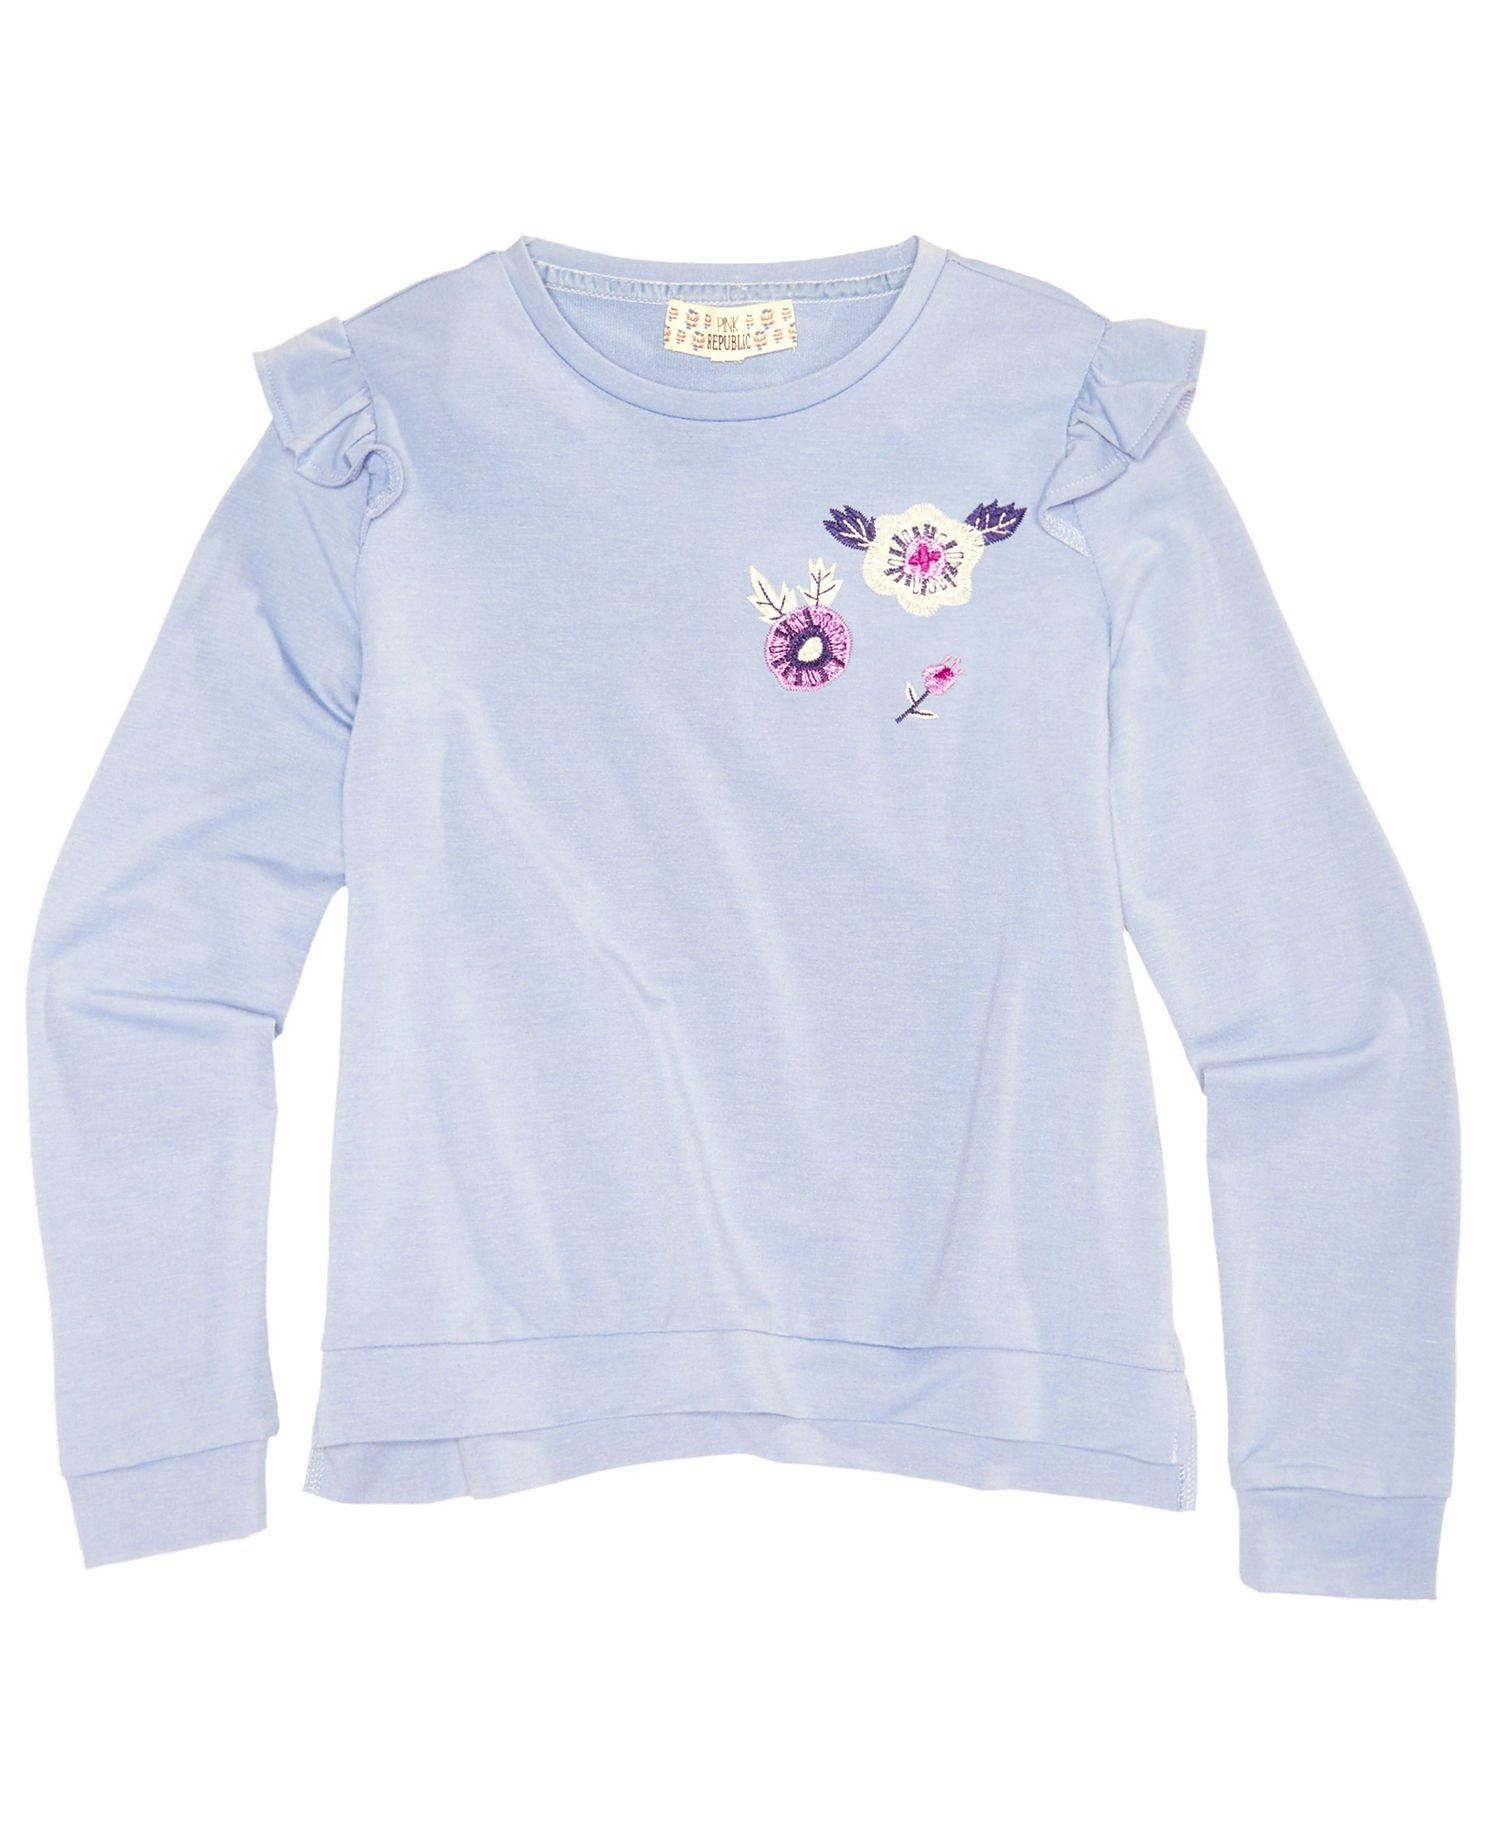 Pink Republic Girls Pullover Shirt (Medium, Powder Haze)